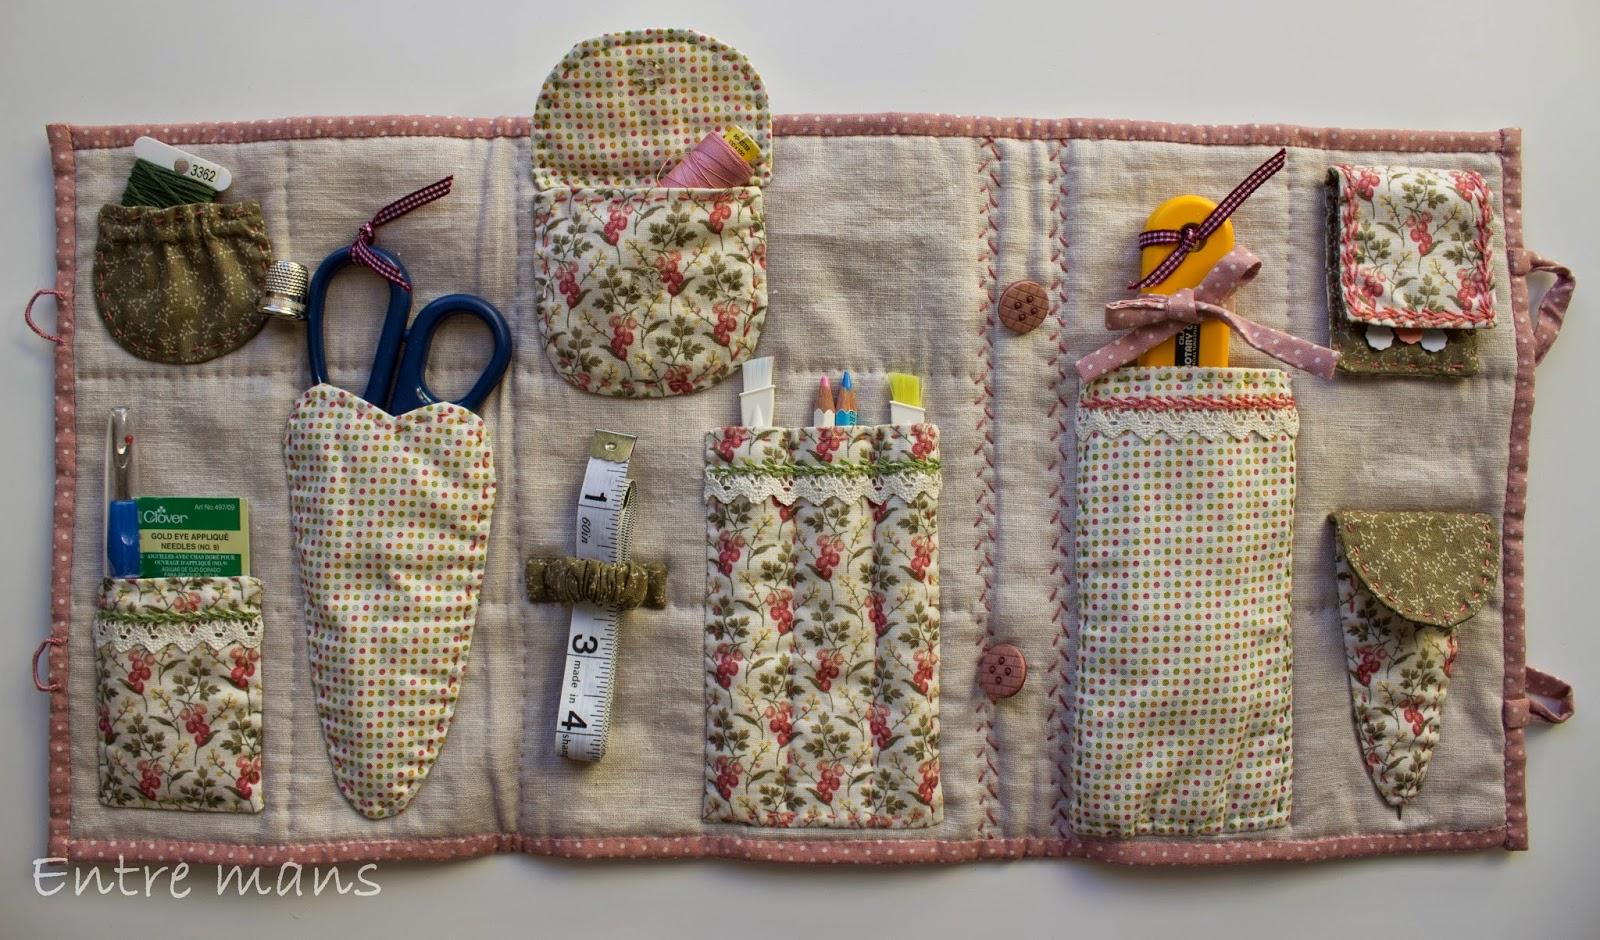 Entre mans costurero - La casita del patchwork ...